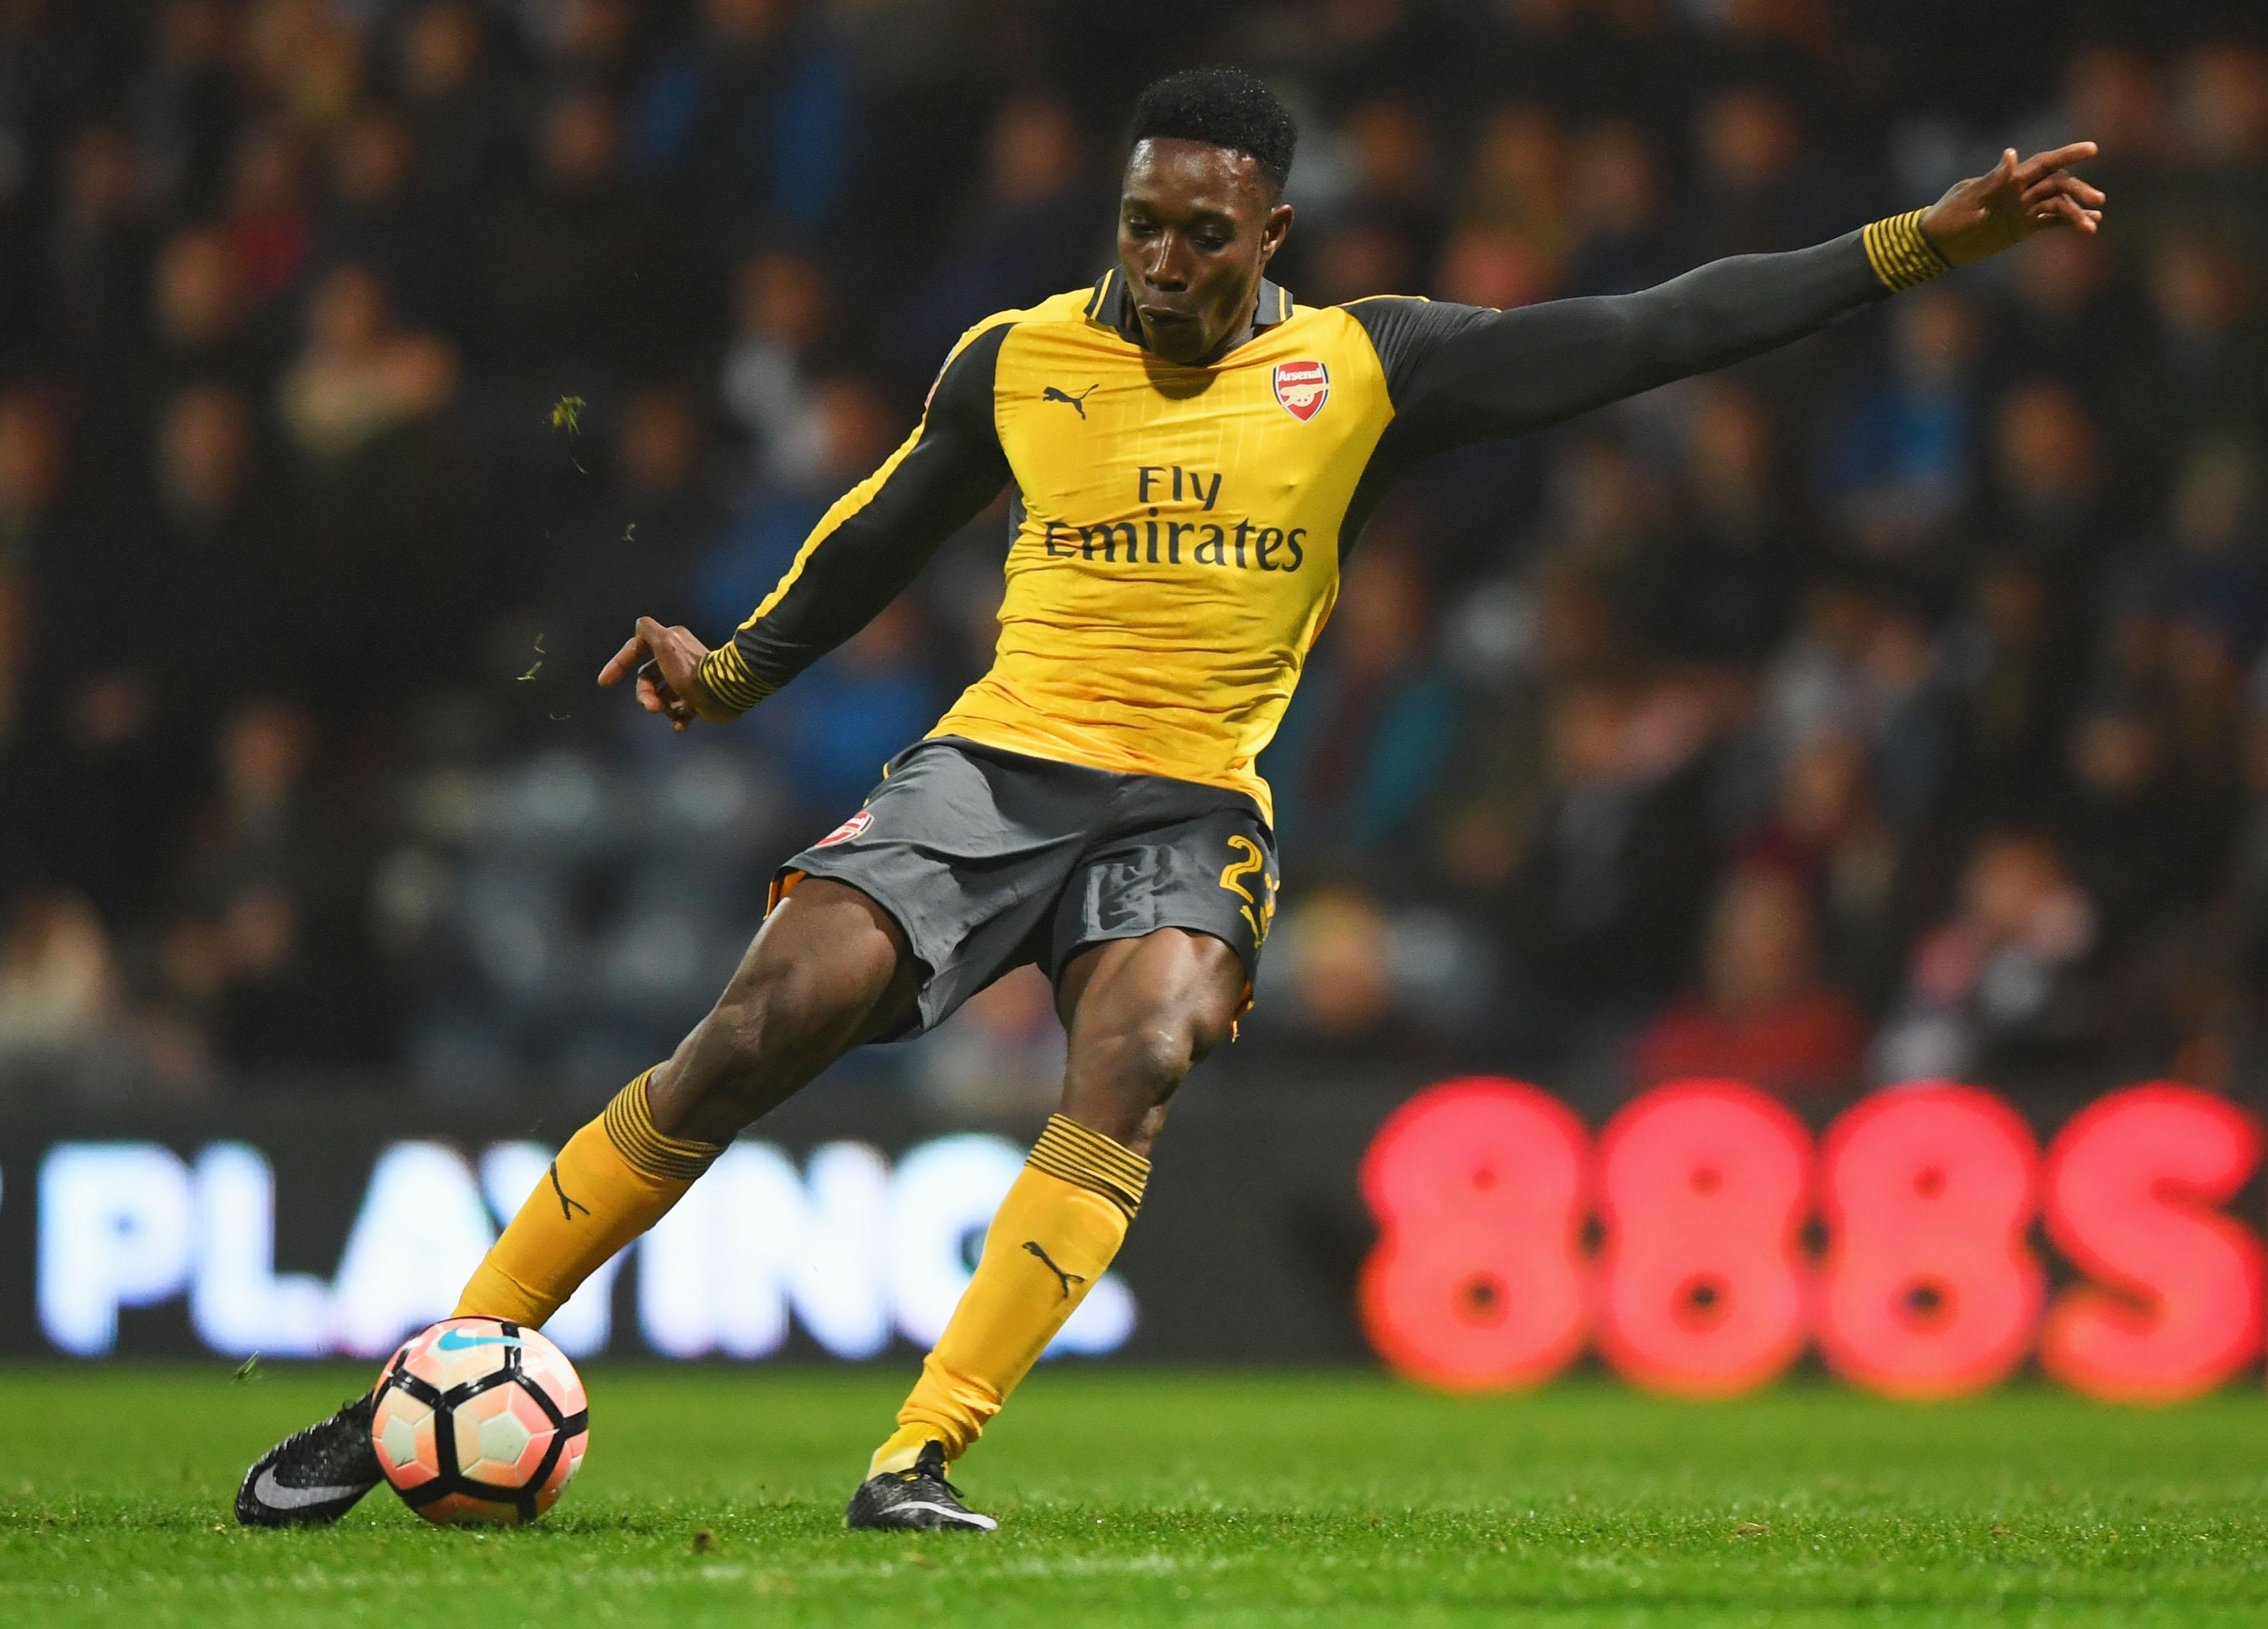 Preston North End v Arsenal - The Emirates FA Cup Third Round